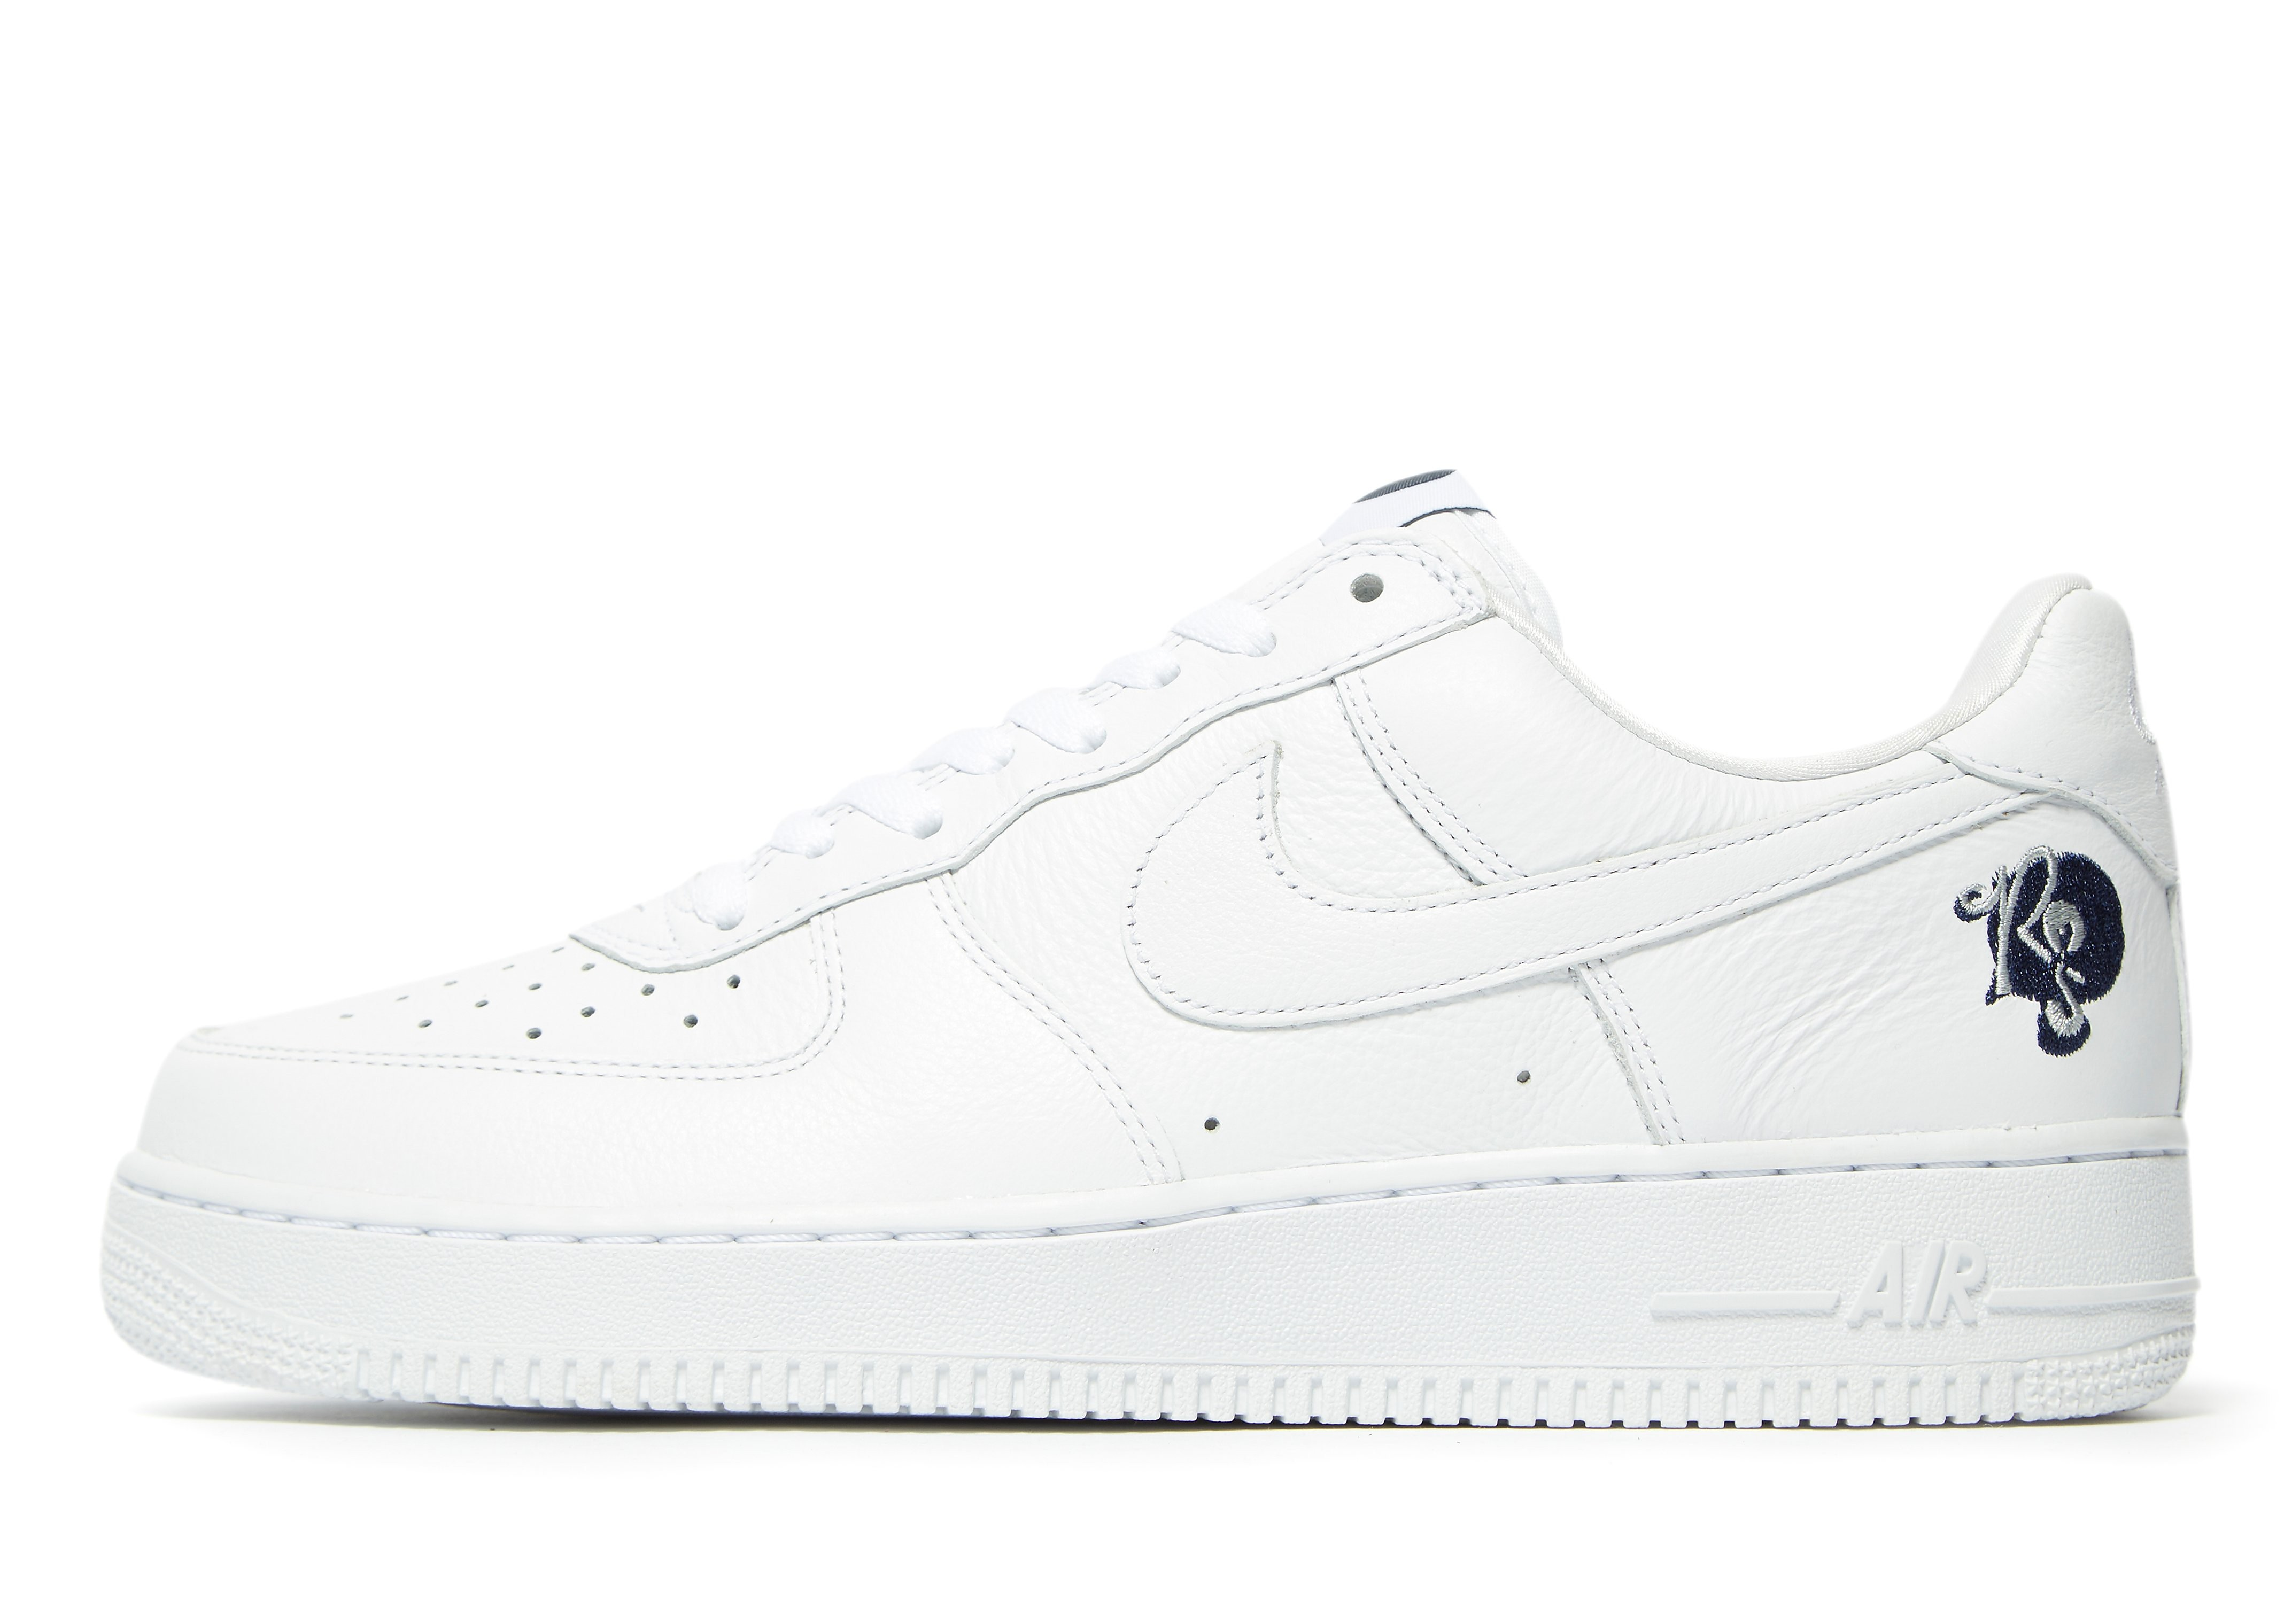 Nike Air Force 1 Roc-A-Fella Women's